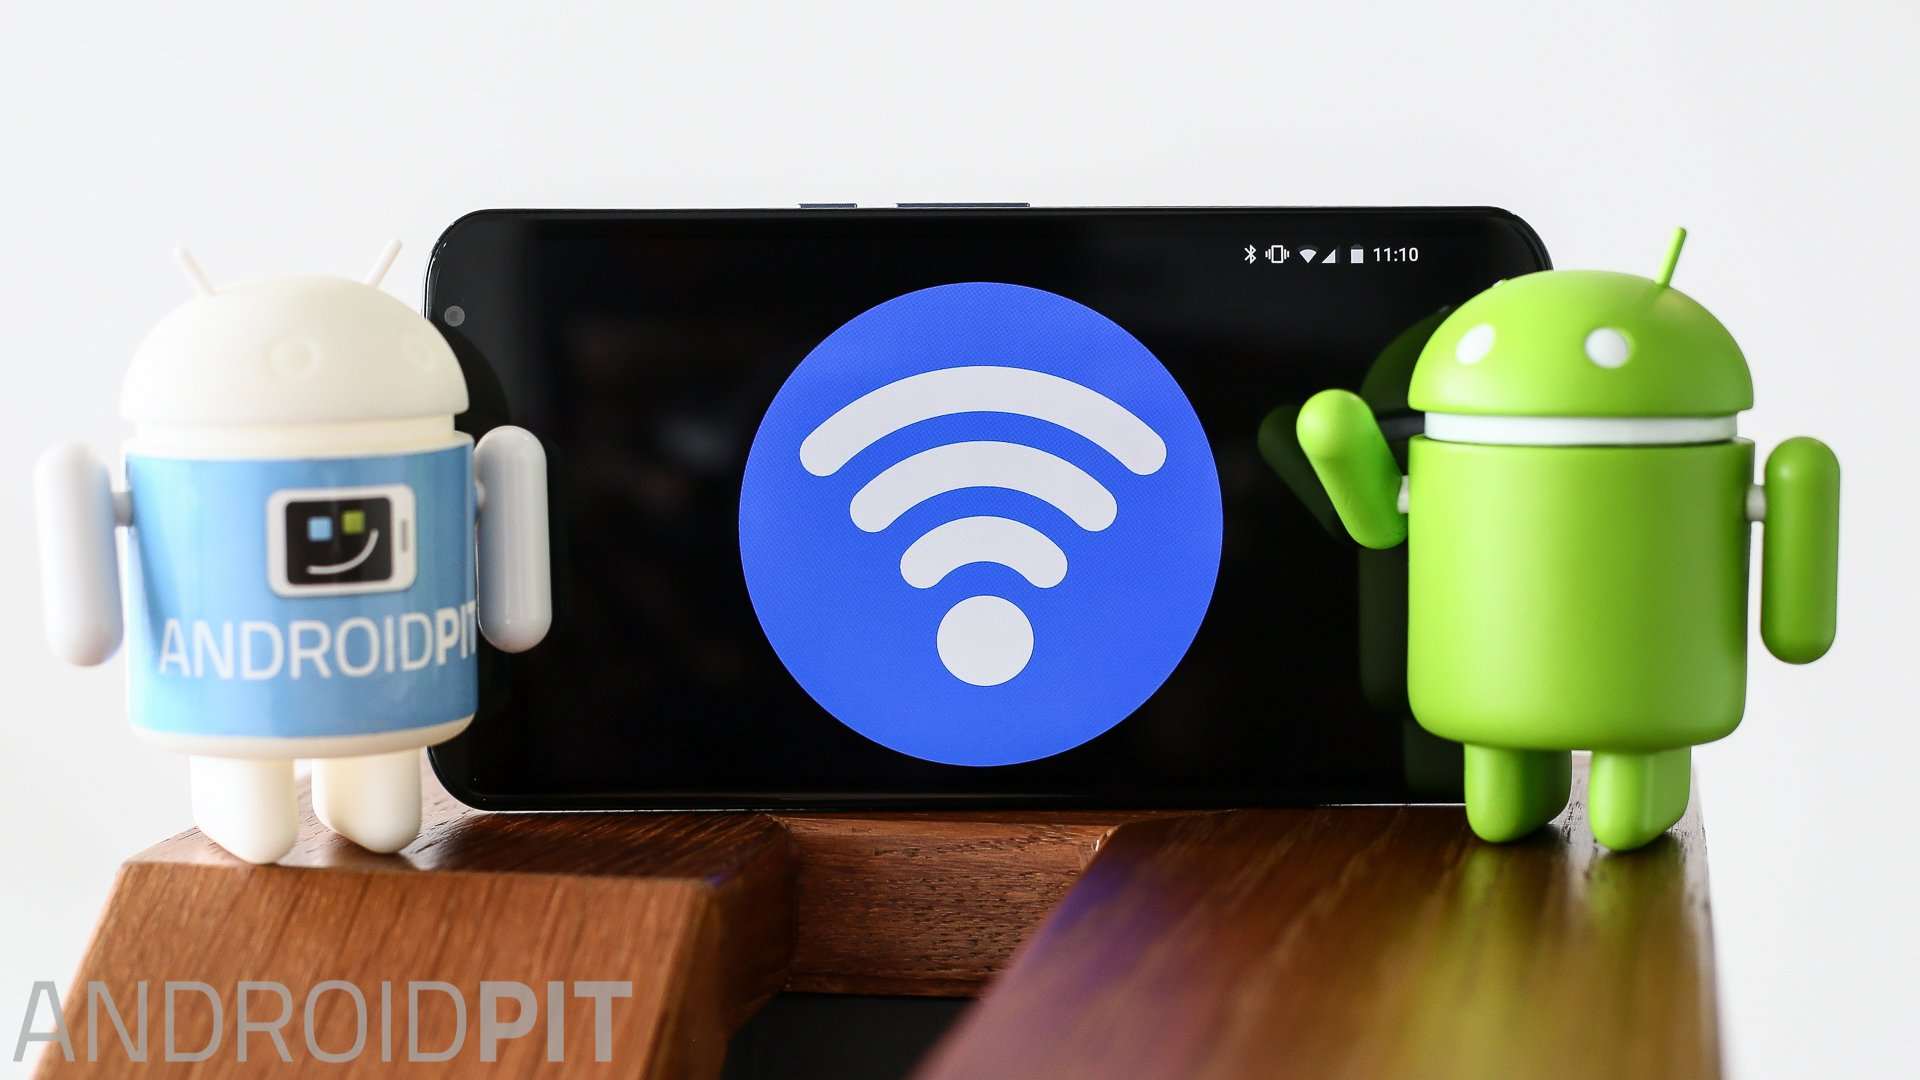 c mo mejorar la se al wifi con tu smartphone android. Black Bedroom Furniture Sets. Home Design Ideas